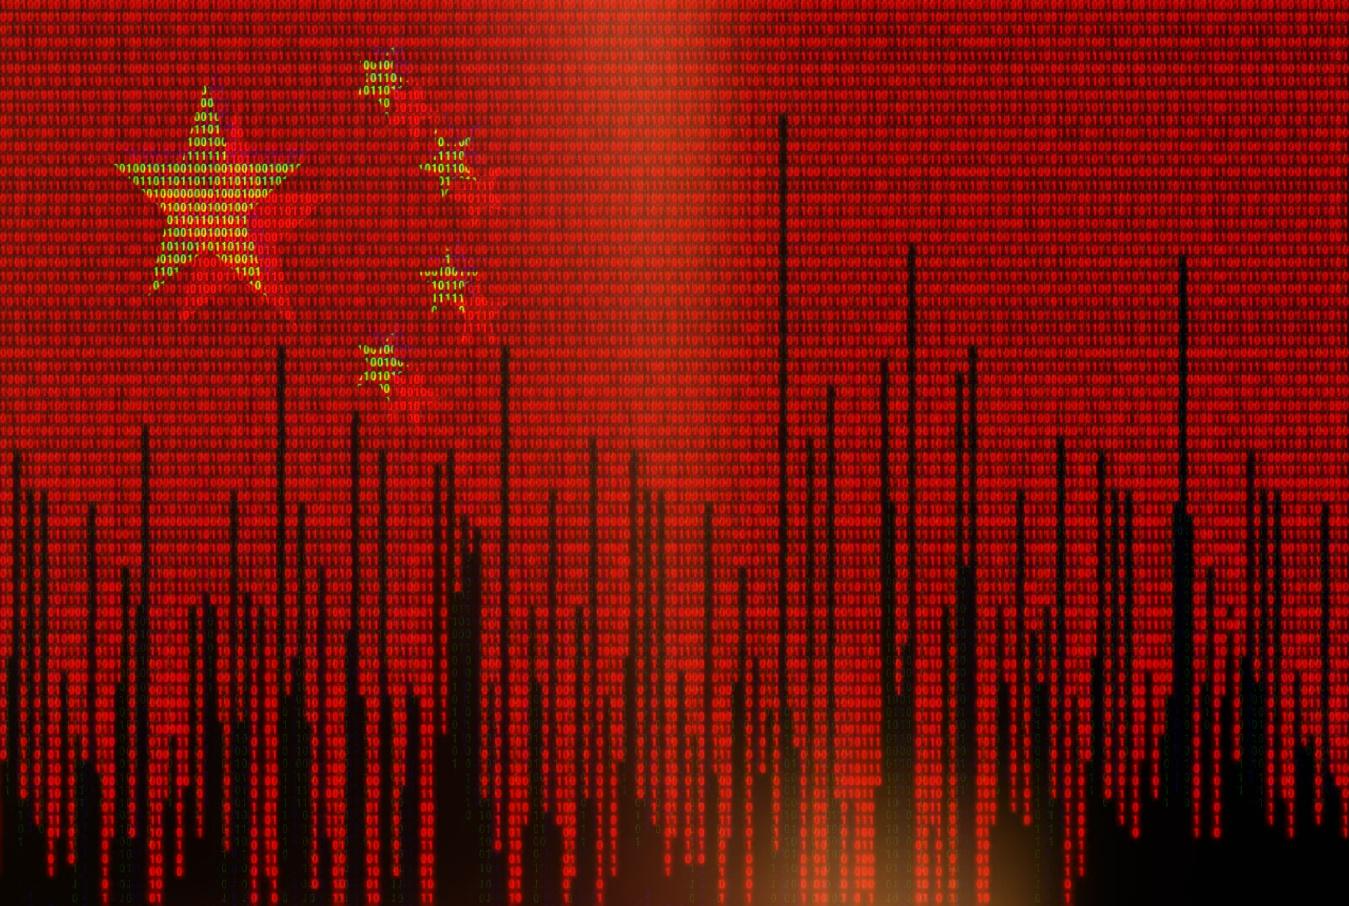 Unprotected-mongodb-leaks-resumes-chinese-job-seekers-2